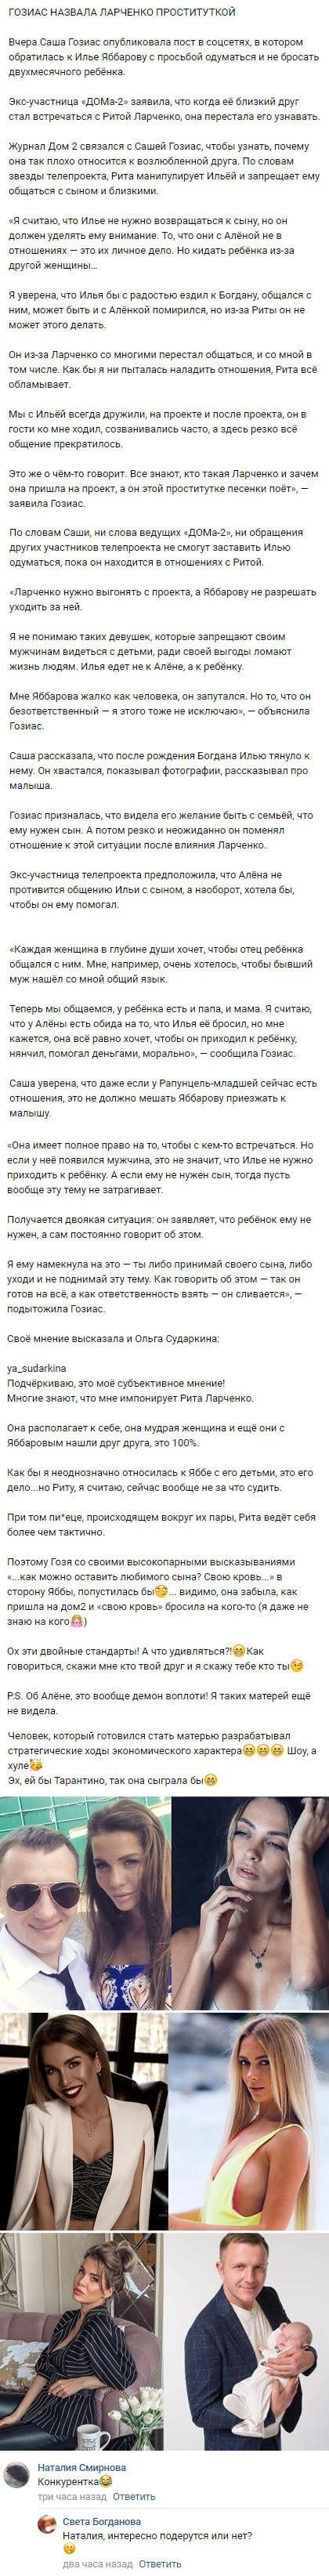 Александра Гозиас начала наезжать на Маргариту Ларченко